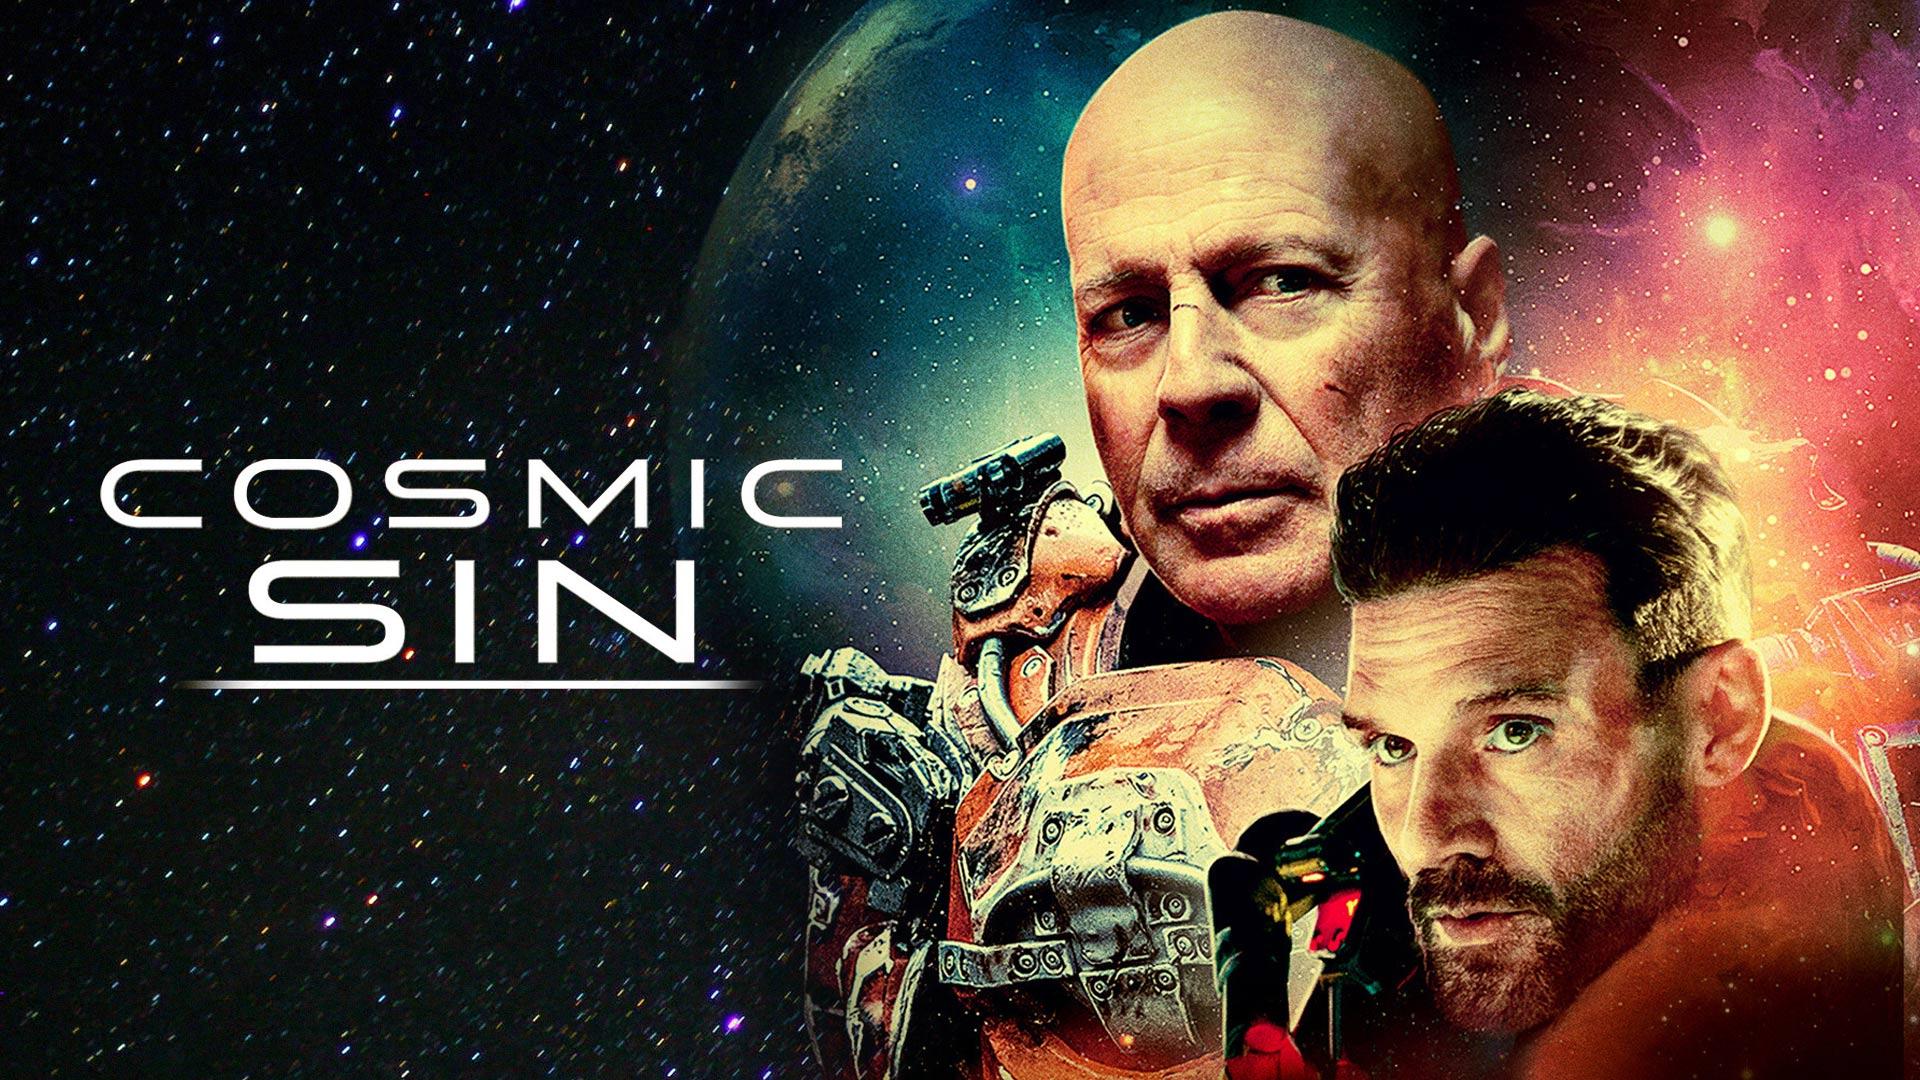 Cosmic Sin - Invasion im All [dt./OV]